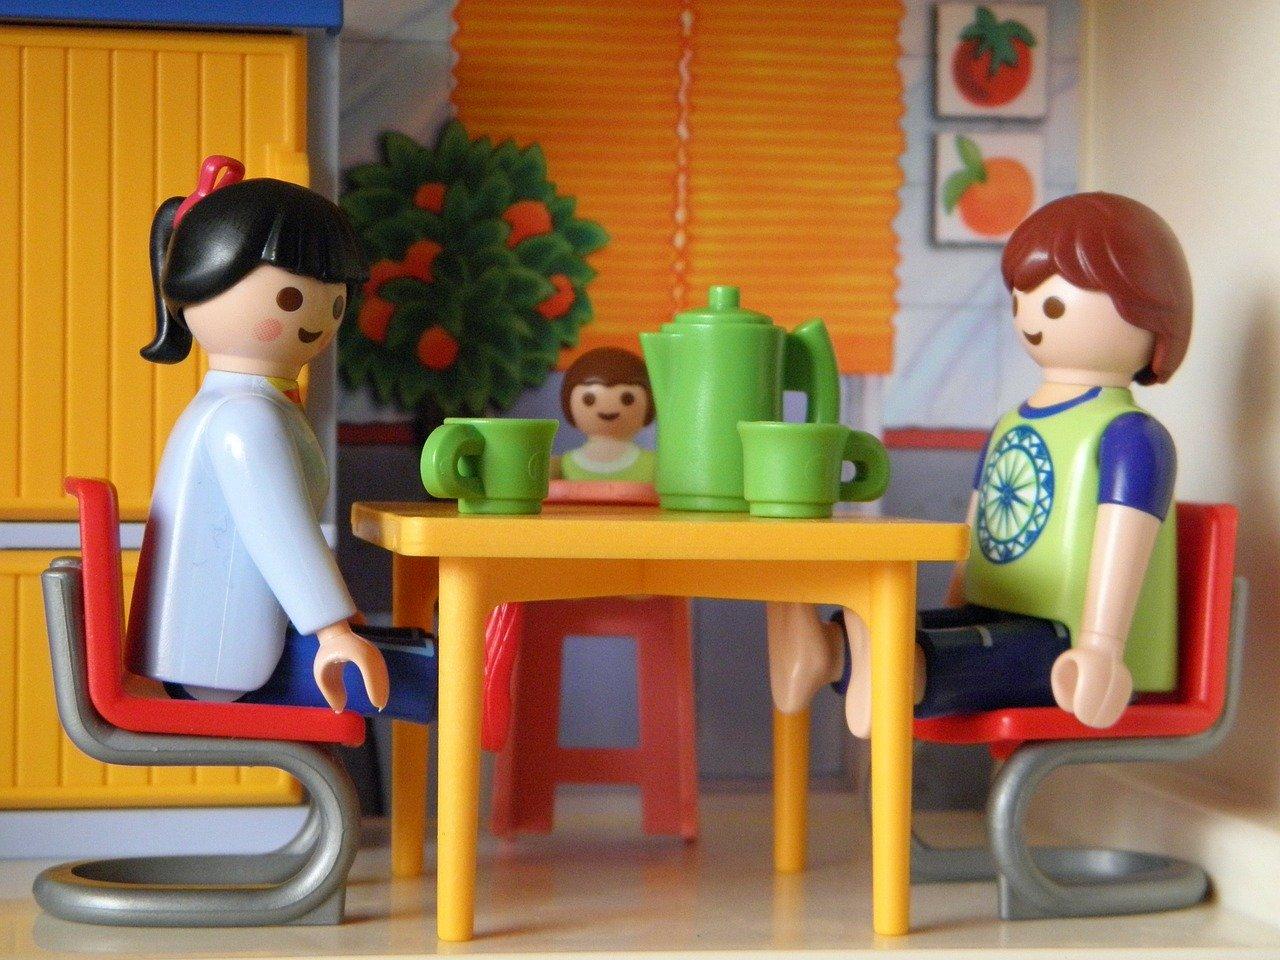 Familia de Playmovil desayuna